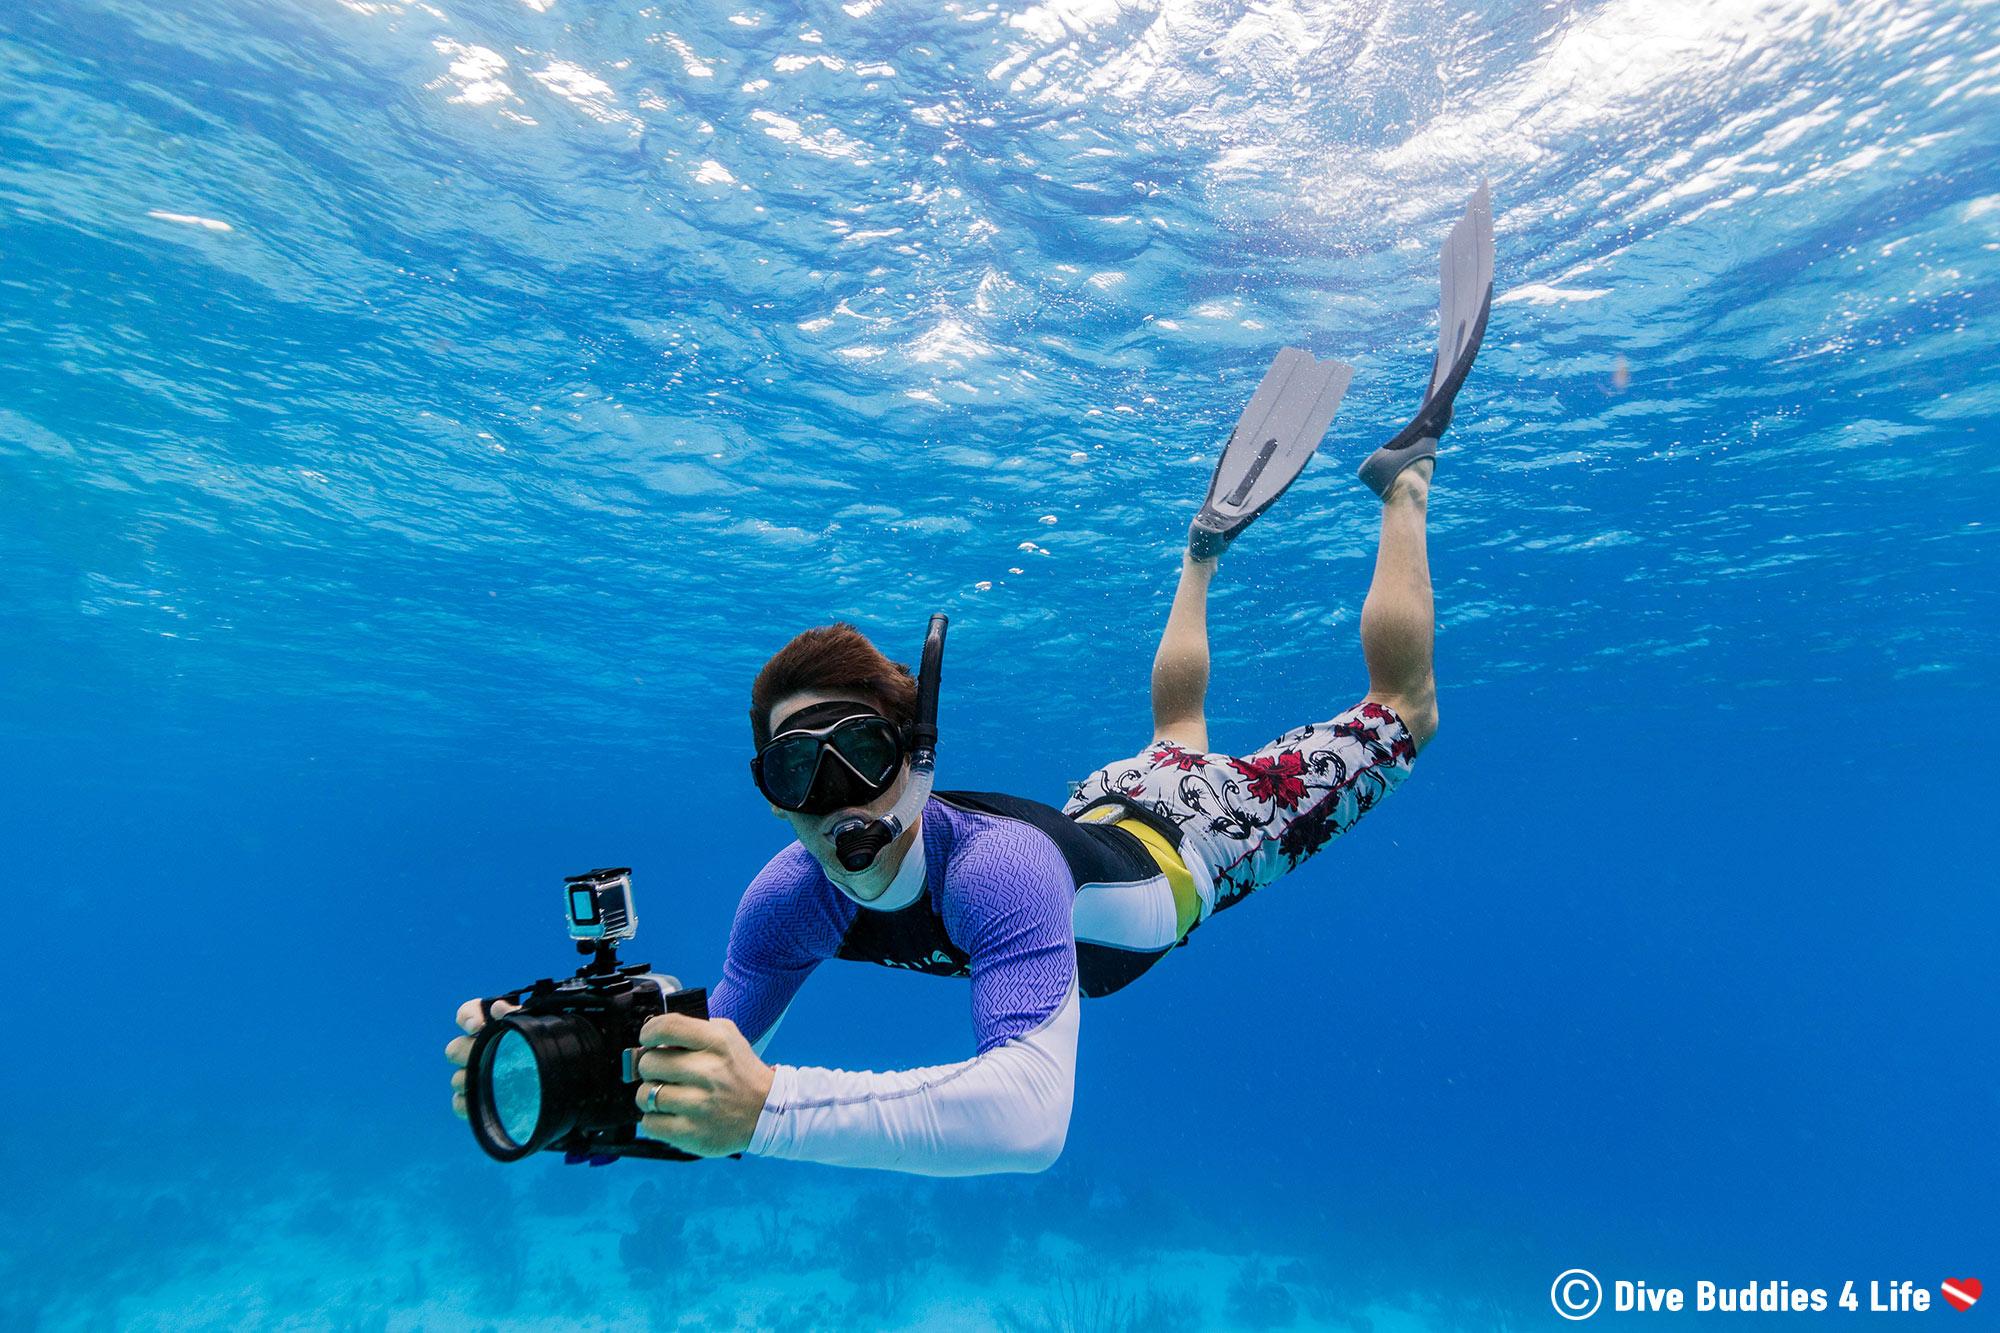 Camera Man Joey In His Snorkeling Gear At Klein Bonaire, Dutch Caribbean